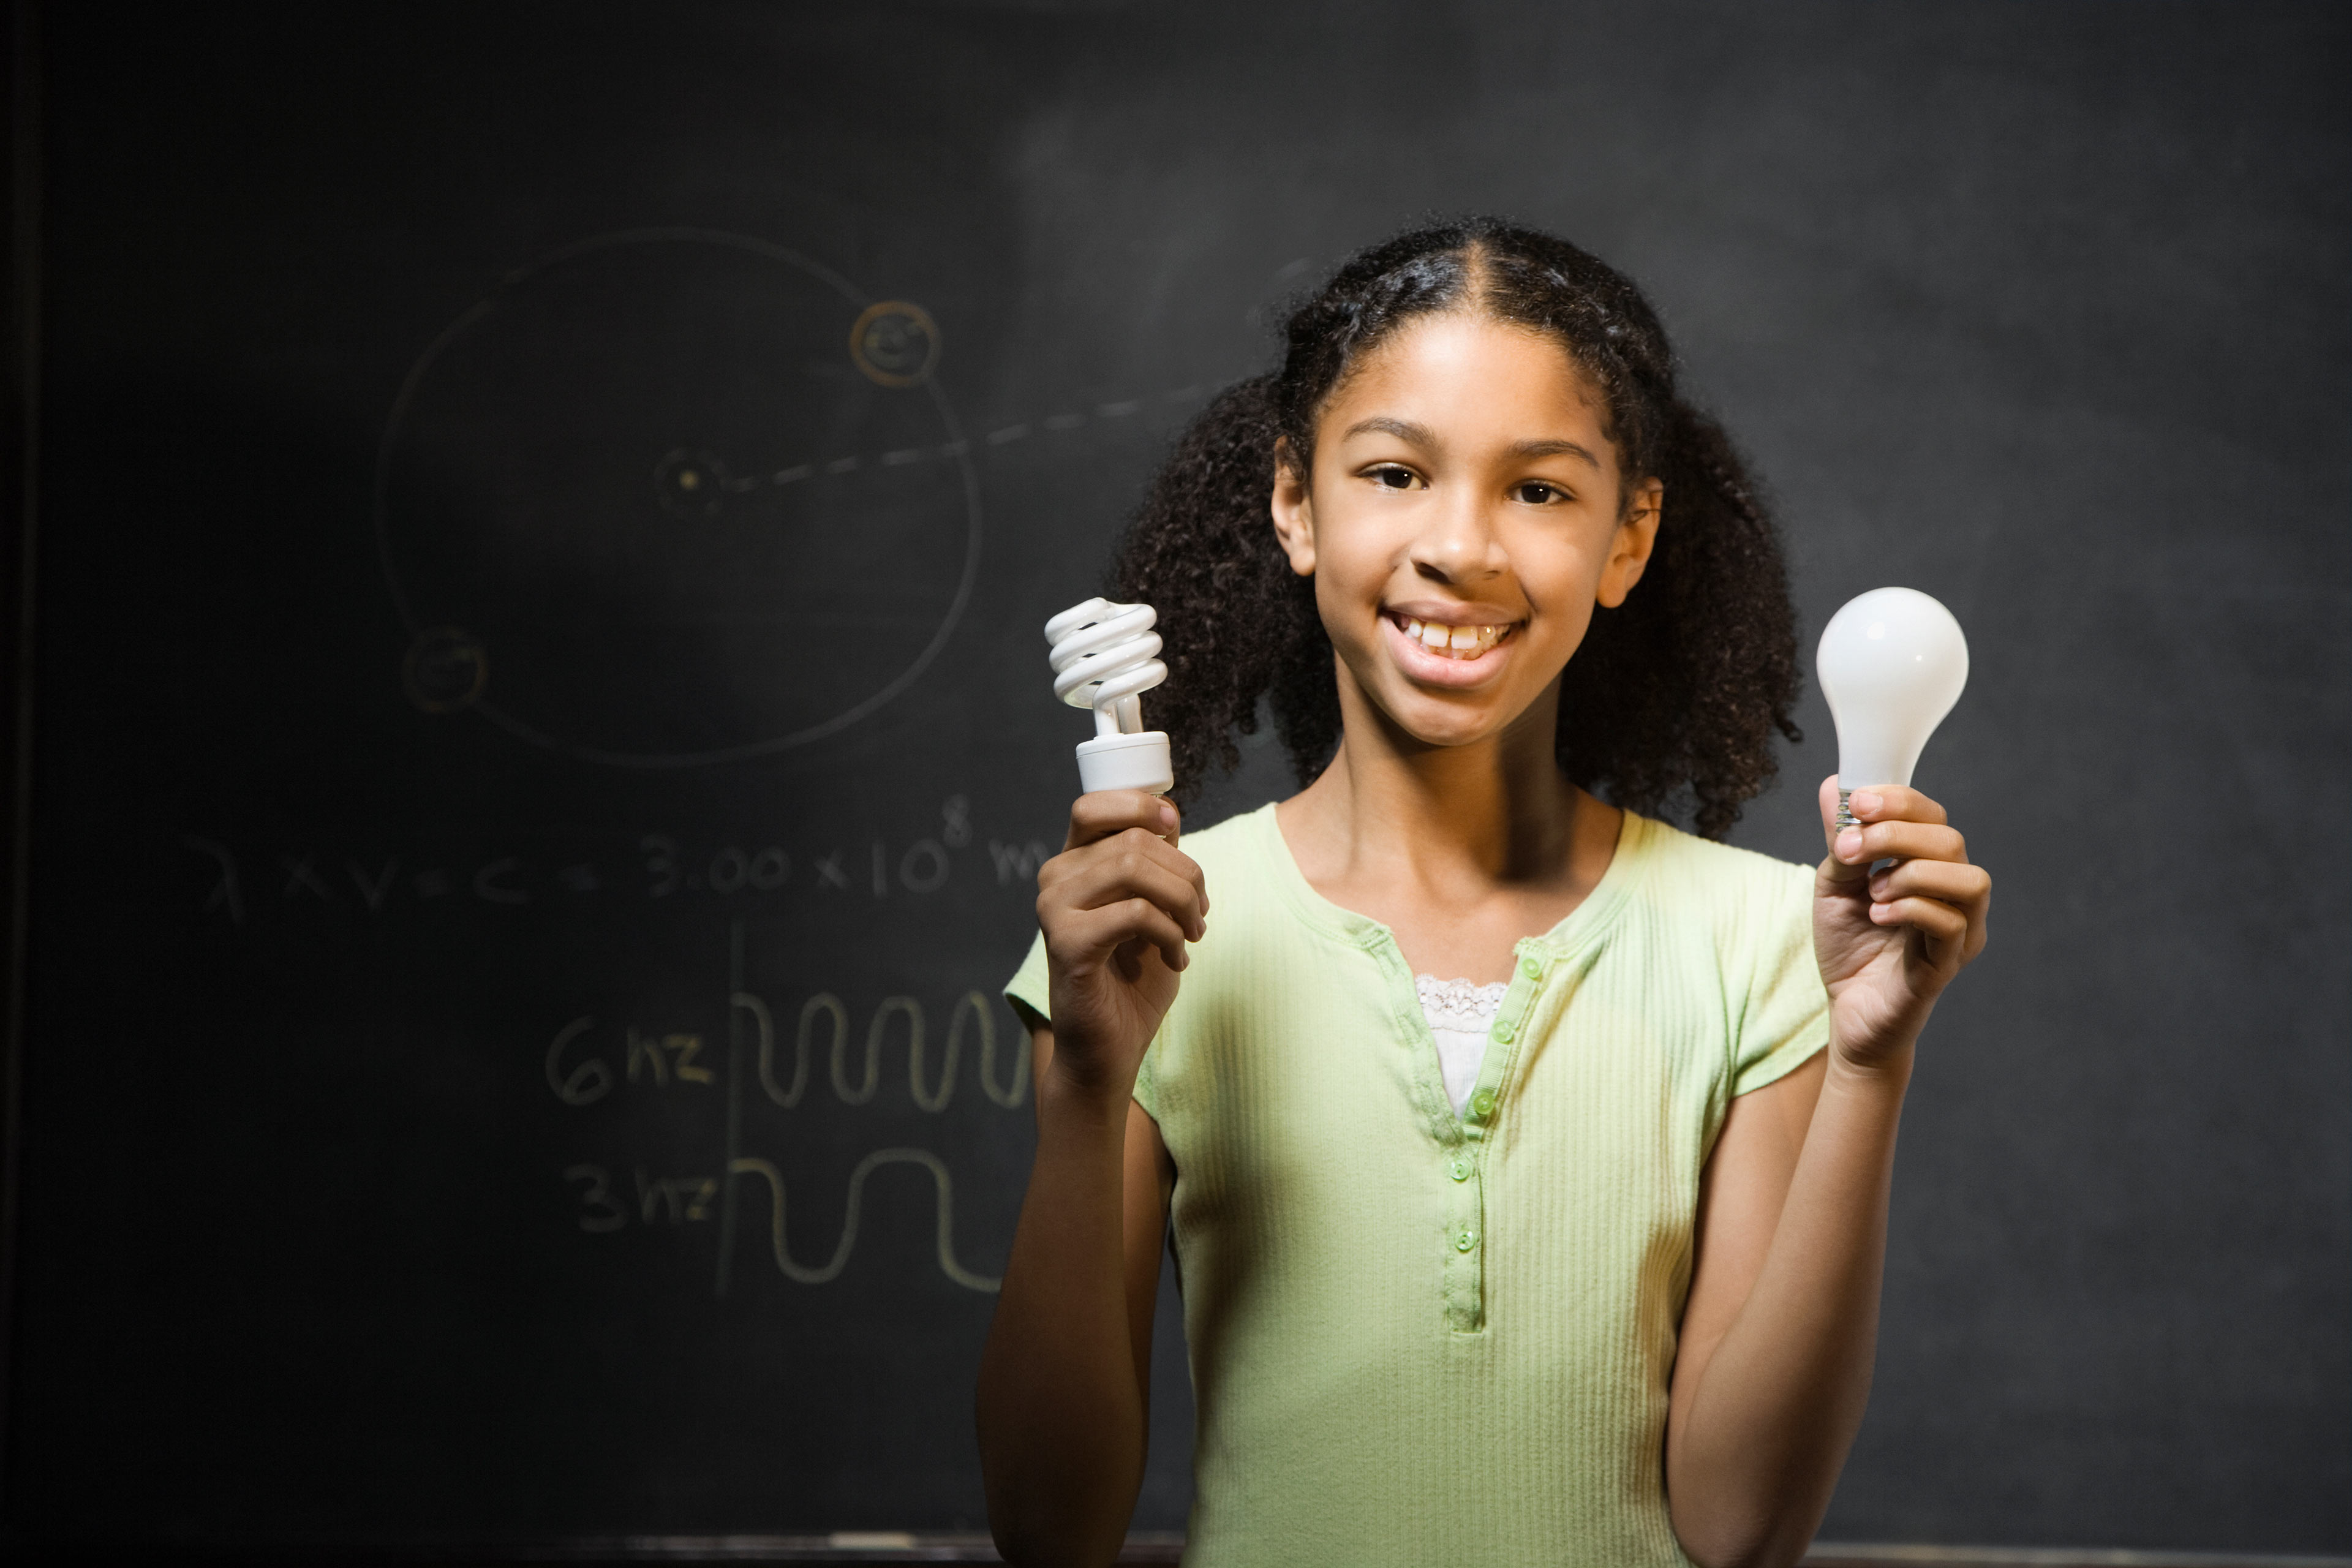 Mixed Race girl holding light bulbs